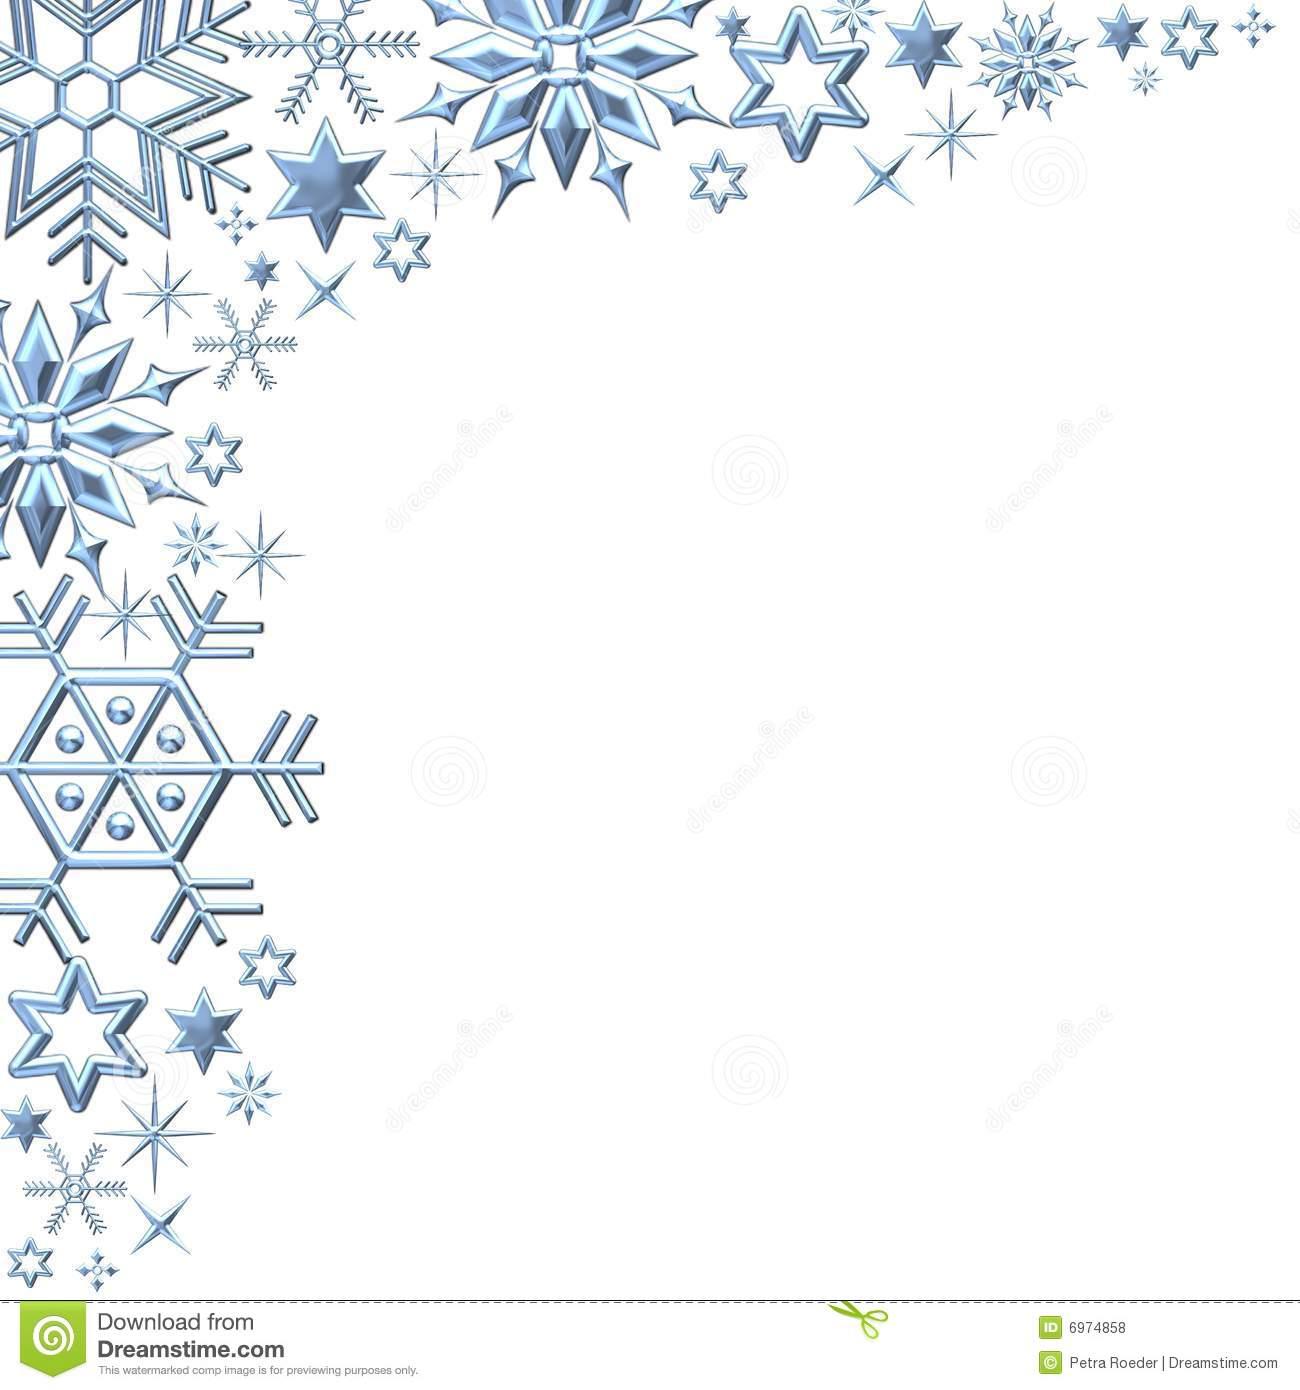 Printable Winter Border .-Printable Winter Border .-7